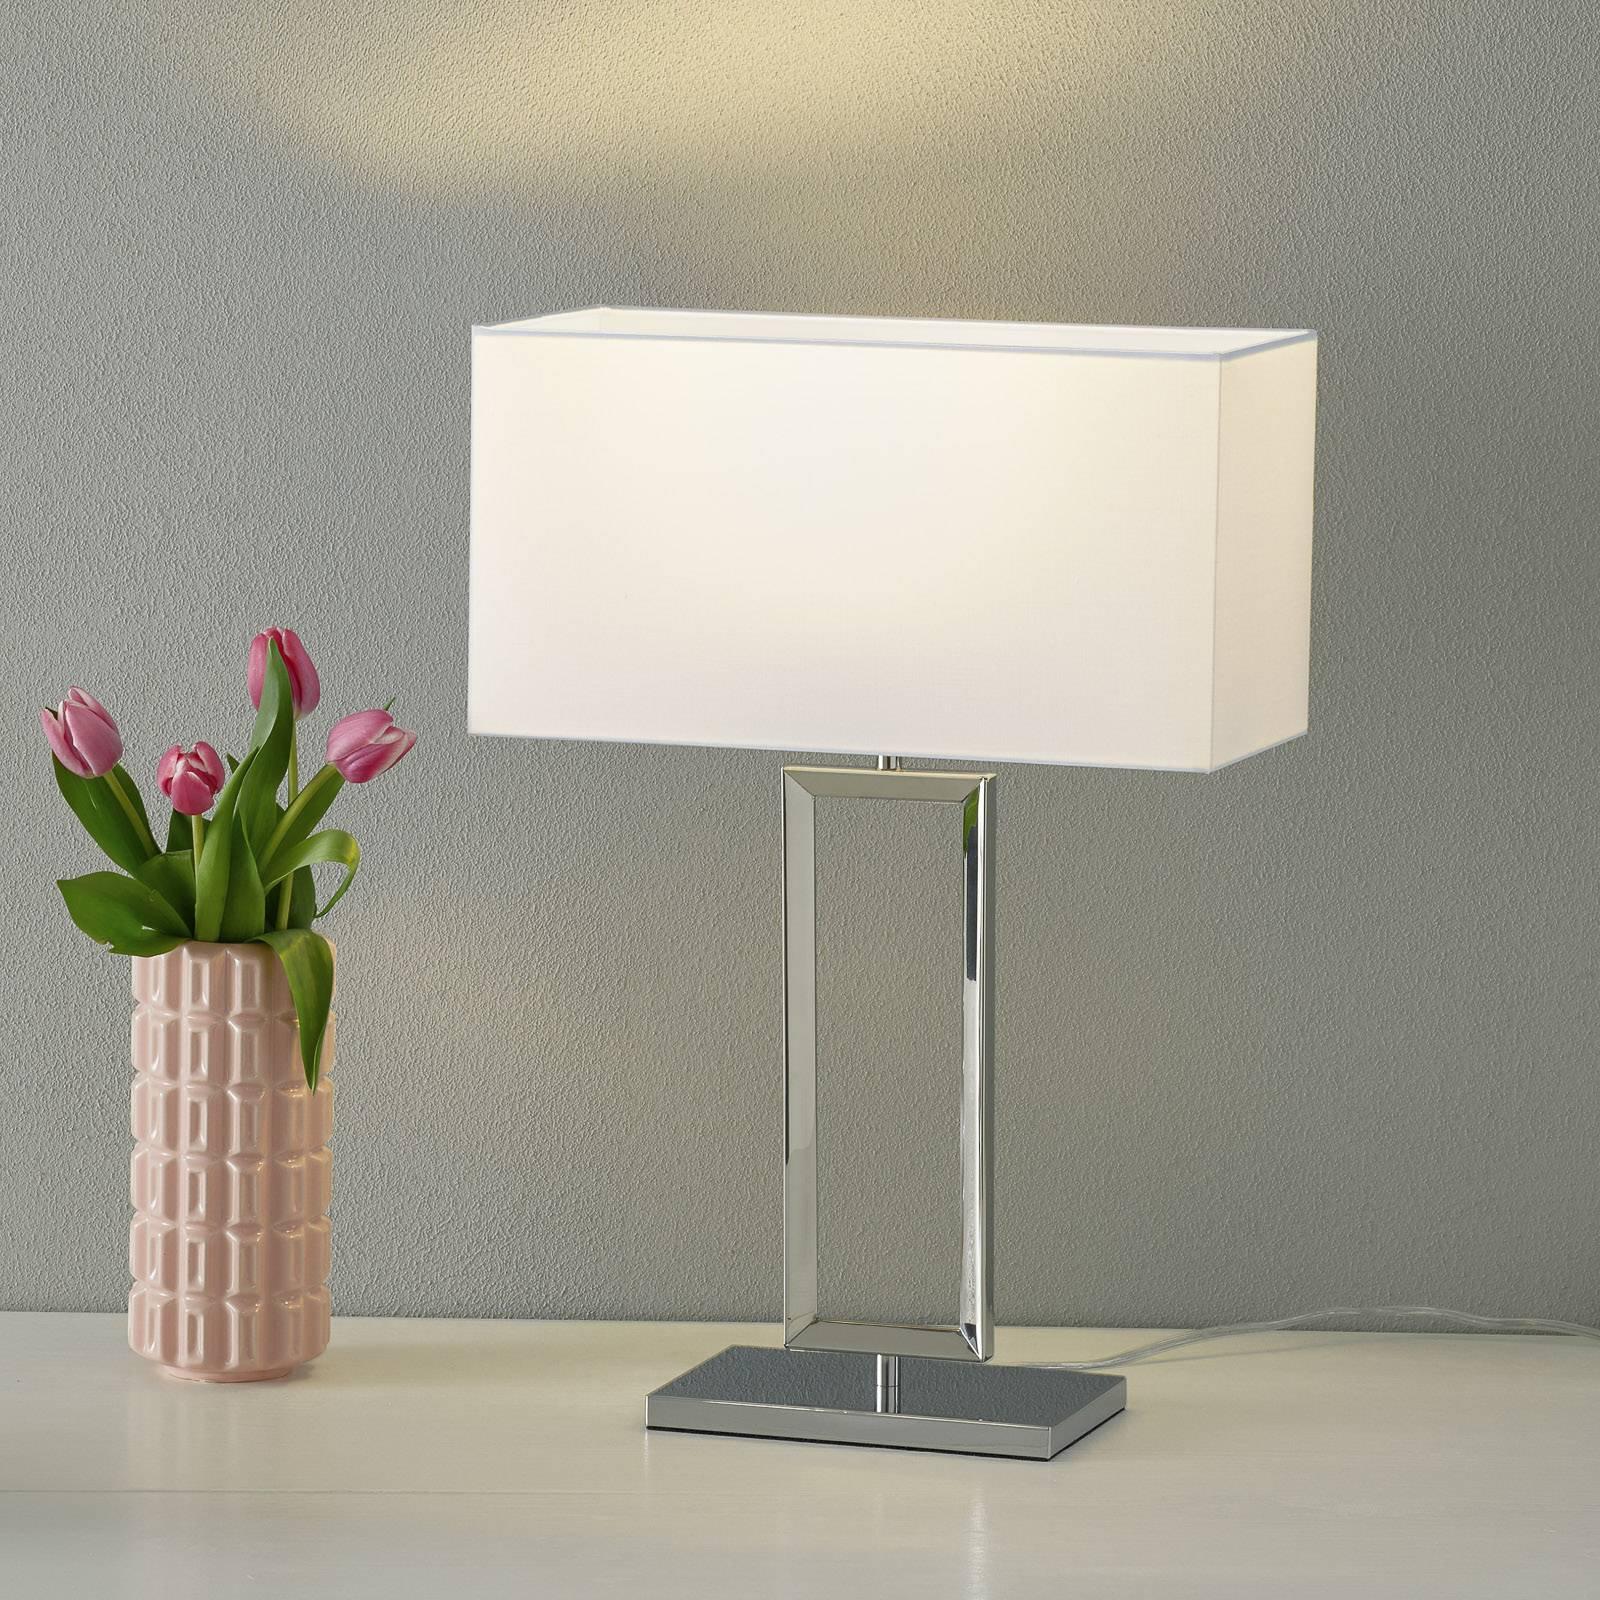 Helestra Enna 2 – bordlampe i tekstil, 53 cm